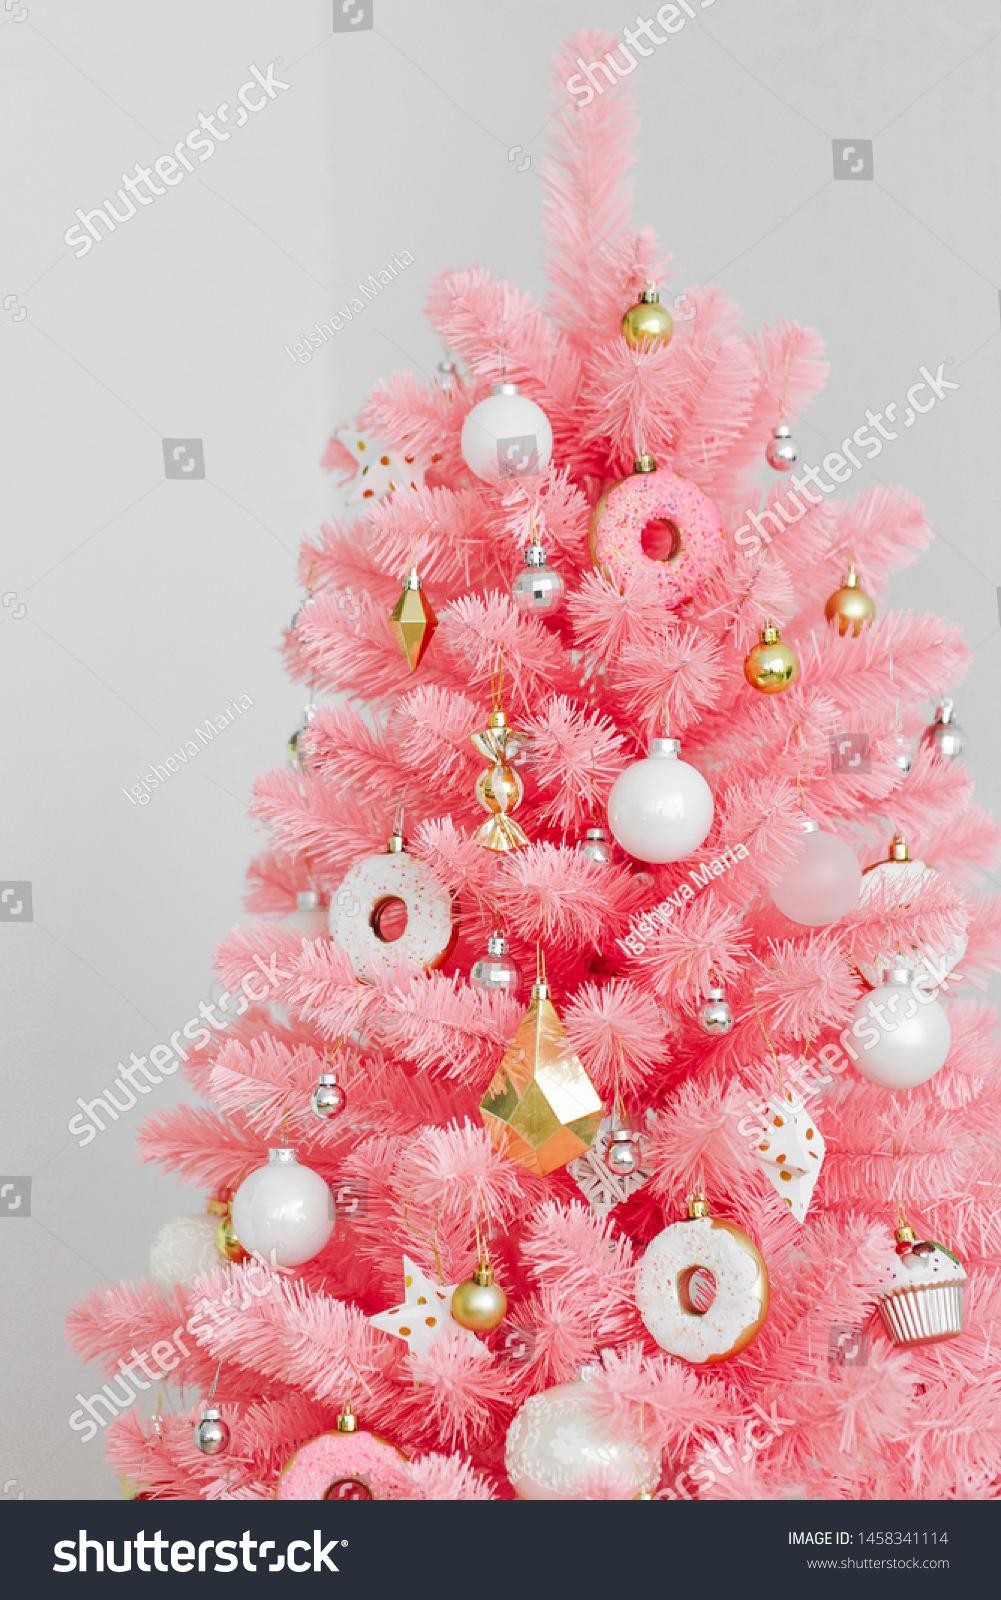 Pink Christmas Tree Christmas Decorations White Stock Photo Edit Now 1458341114